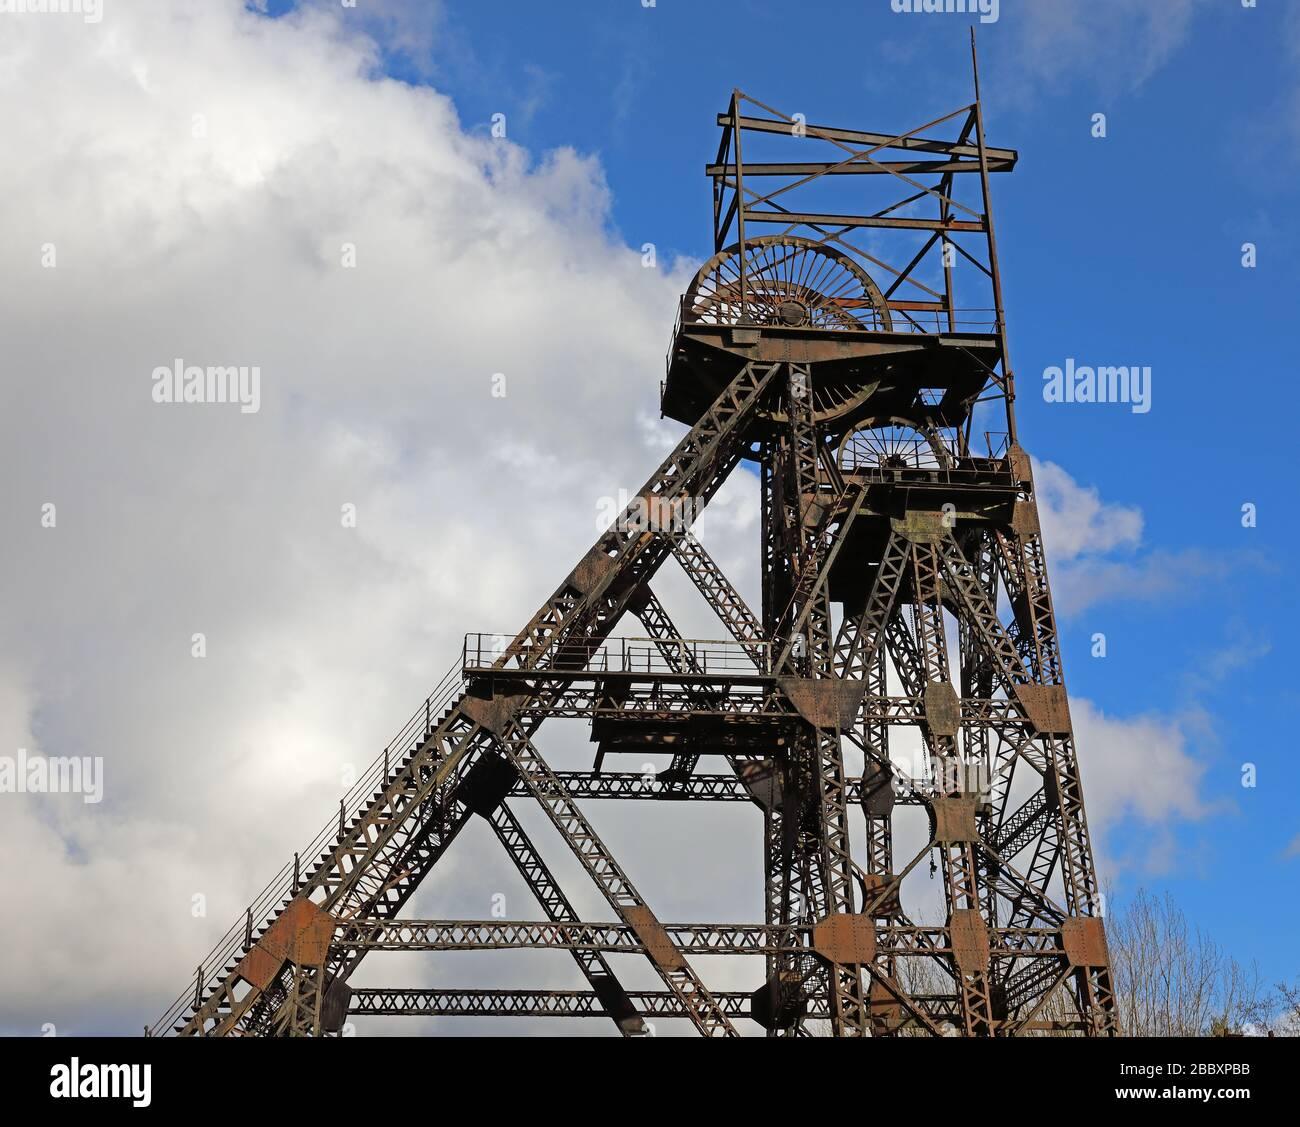 Dieses Stockfoto: Winding Gear und Pit Head, Coal Mine, Colliery and Museum, Astley Green, Manchester, Lancashire, North West England, Großbritannien - 2BBXPB